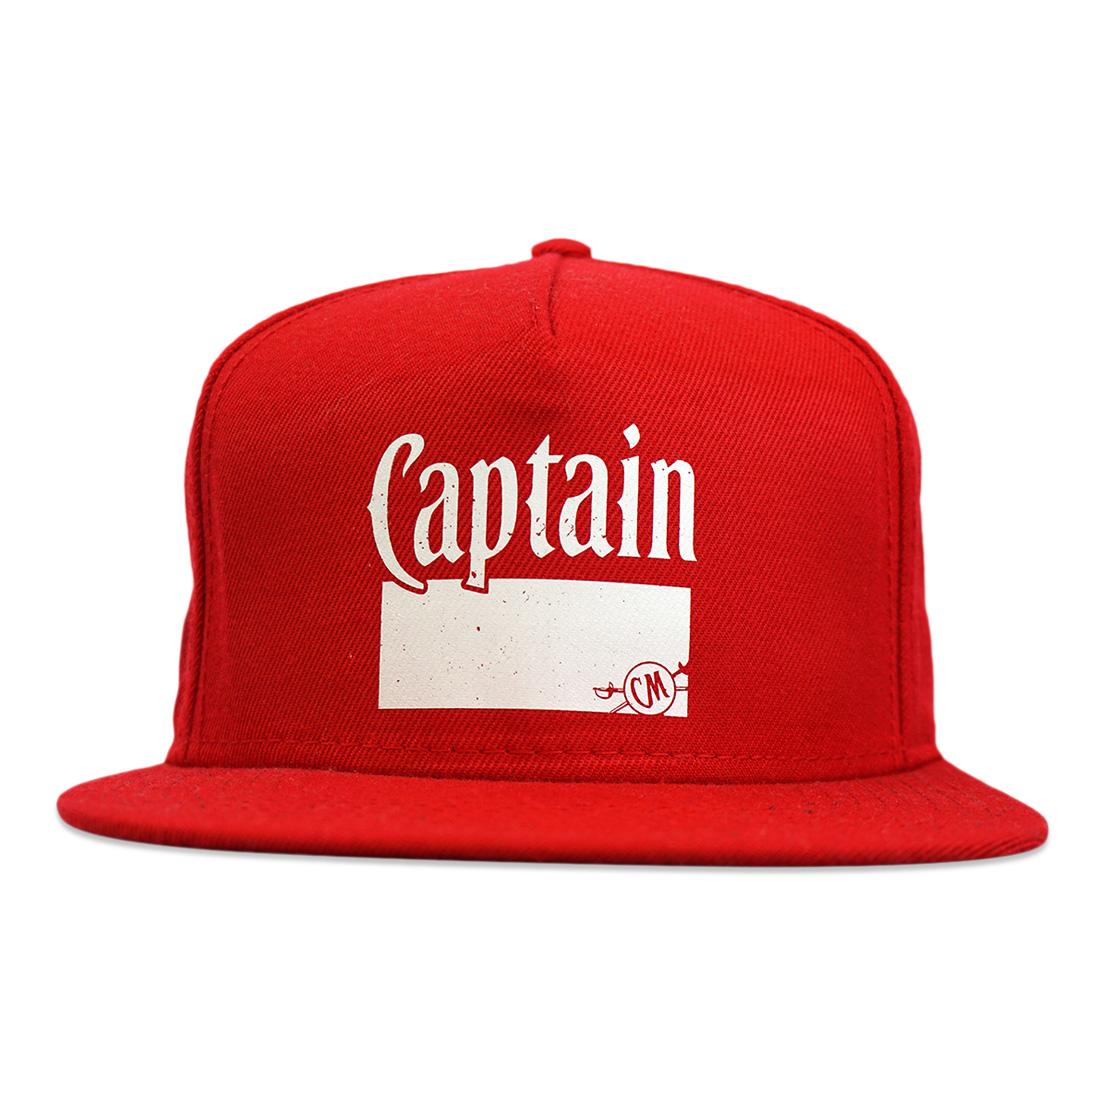 Red Flatbill Cap